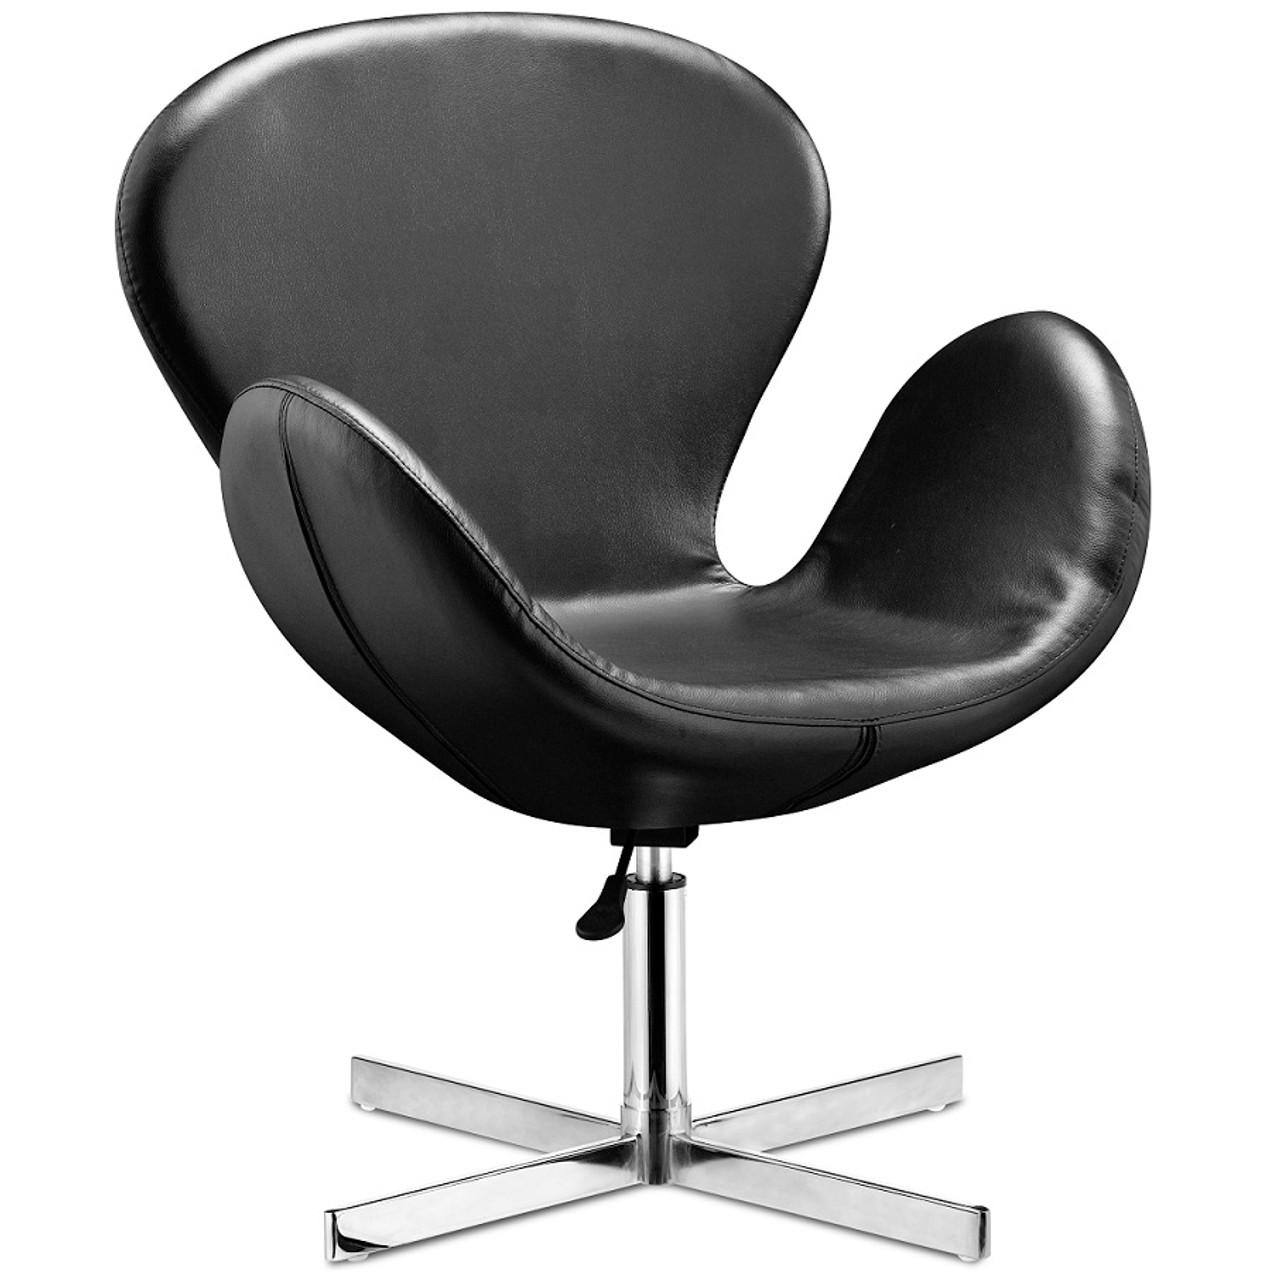 Awe Inspiring Cobble Swan Swivel Chair Bralicious Painted Fabric Chair Ideas Braliciousco